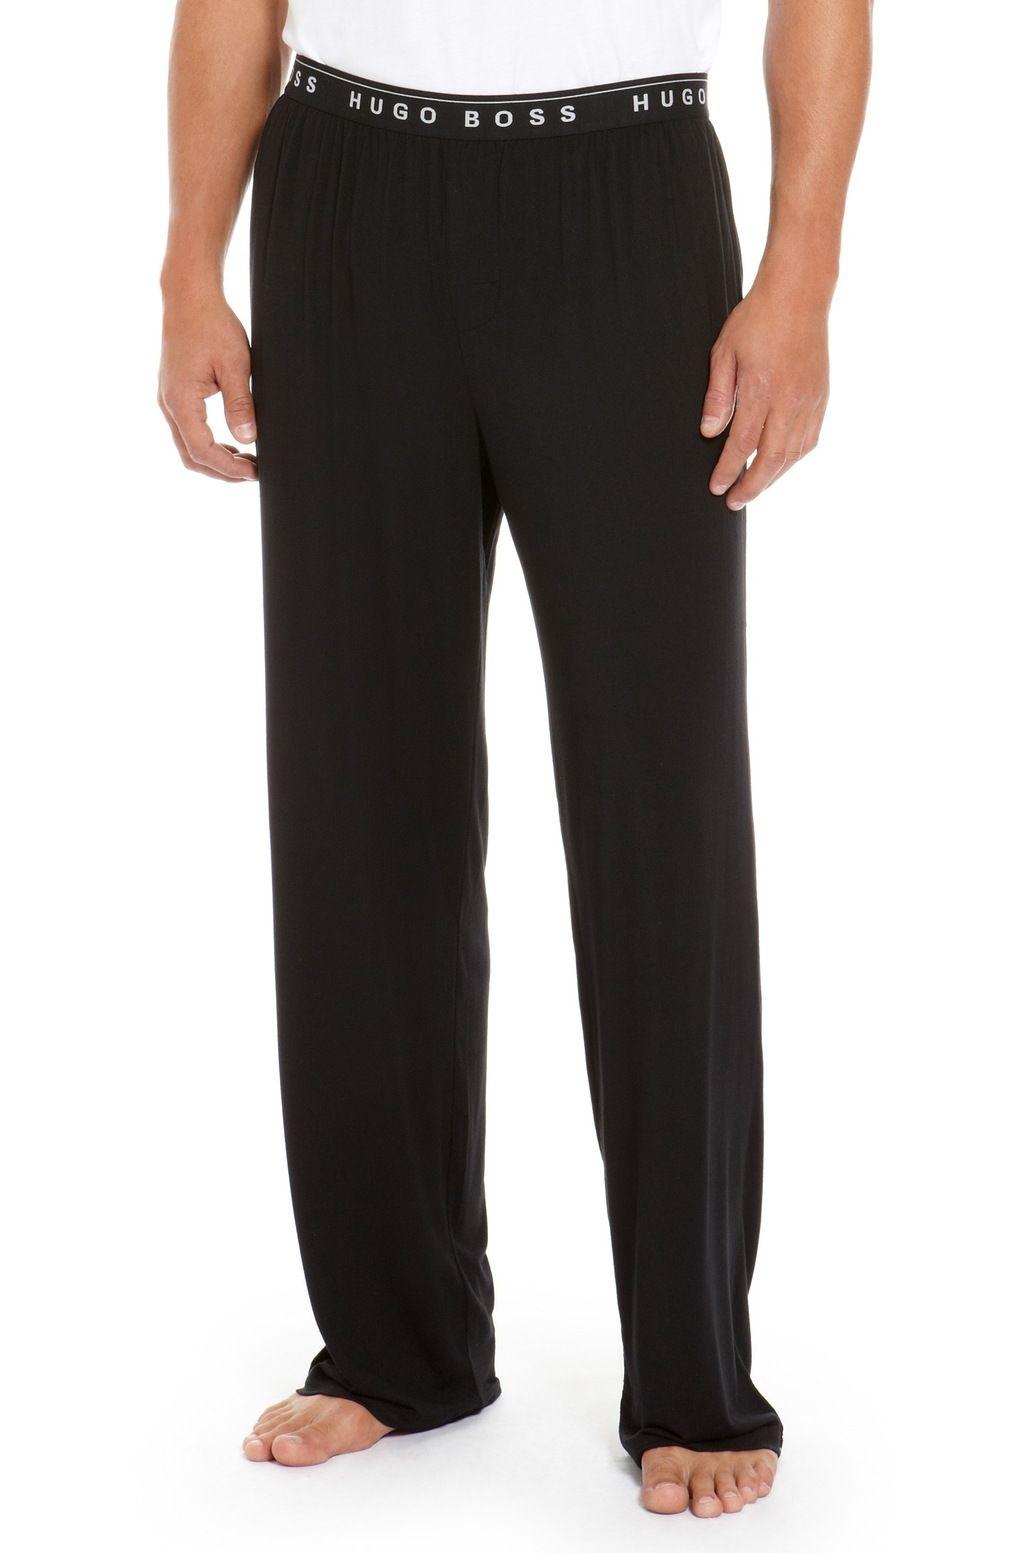 d18a87a3f Hugo Boss - 'Long Pant BM'   Stretch Modal Lounge Pants.   #Men,  #Casualwear, #Loungewear